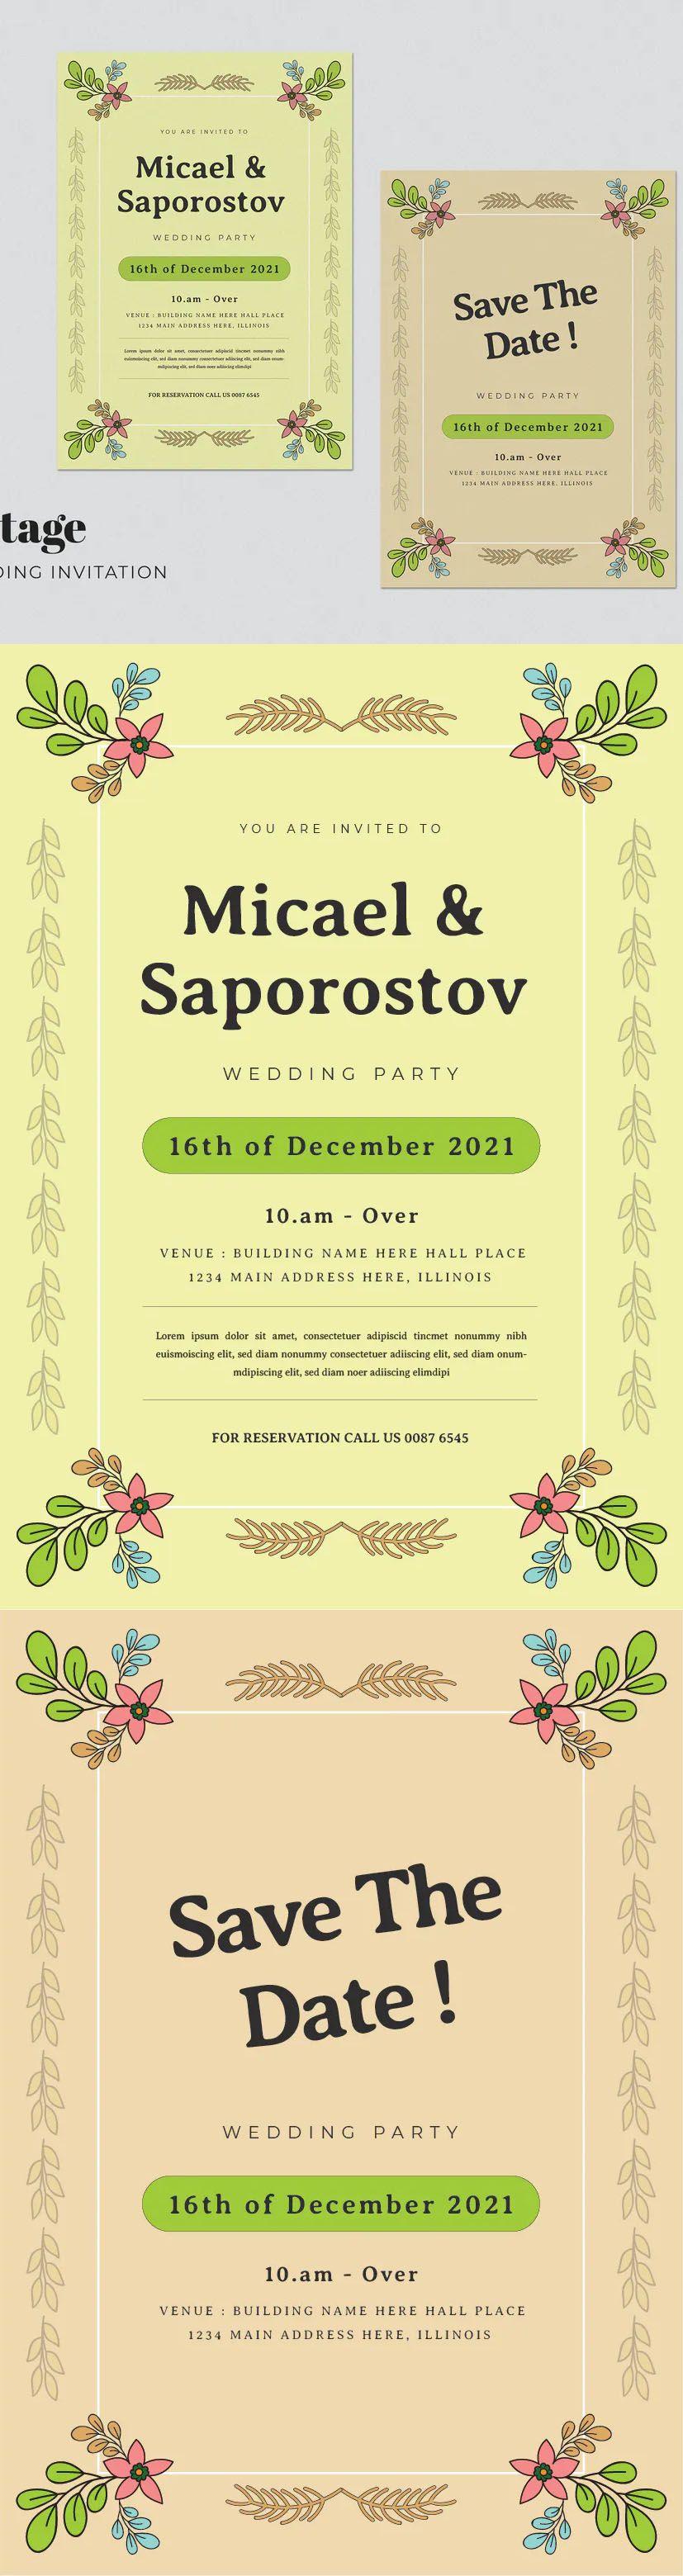 Vintage Wedding Invitation Card Template In 2021 Vintage Wedding Invitations Vintage Wedding Invitation Cards Wedding Invitation Card Template